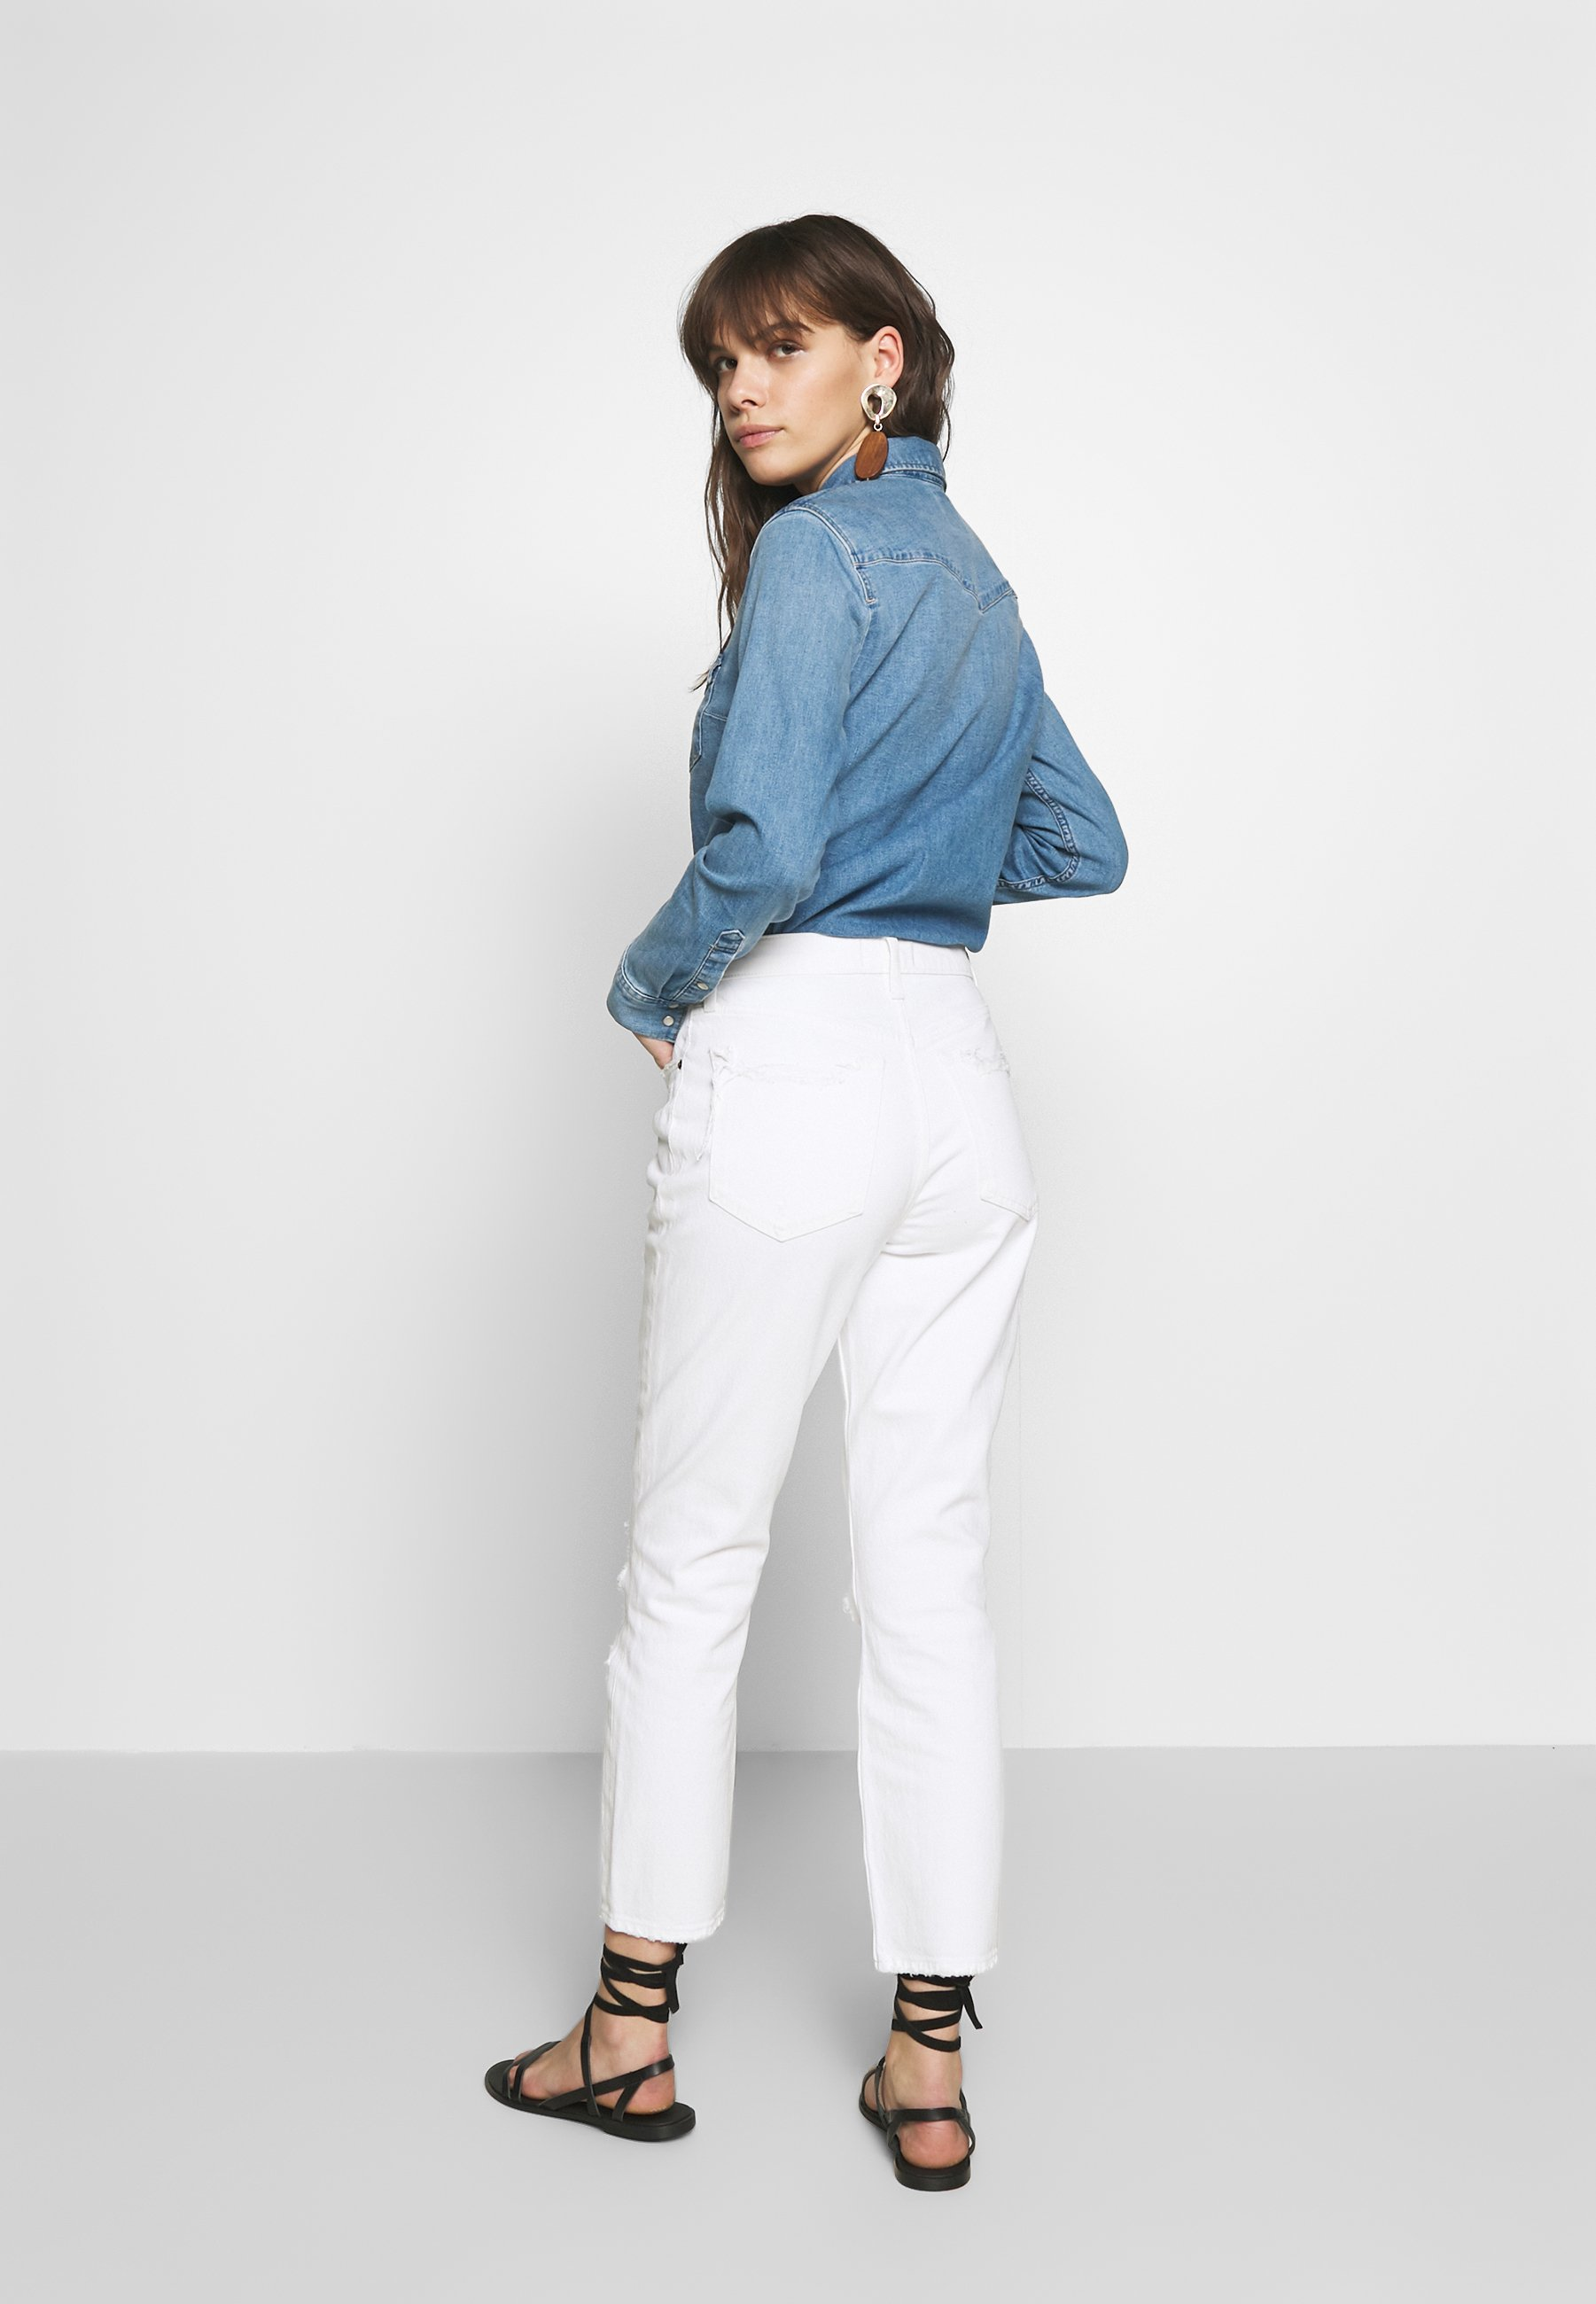 Abercrombie & Fitch KNEE SLITS MOM - Jean slim - white destroy - Jeans Femme XKzfg